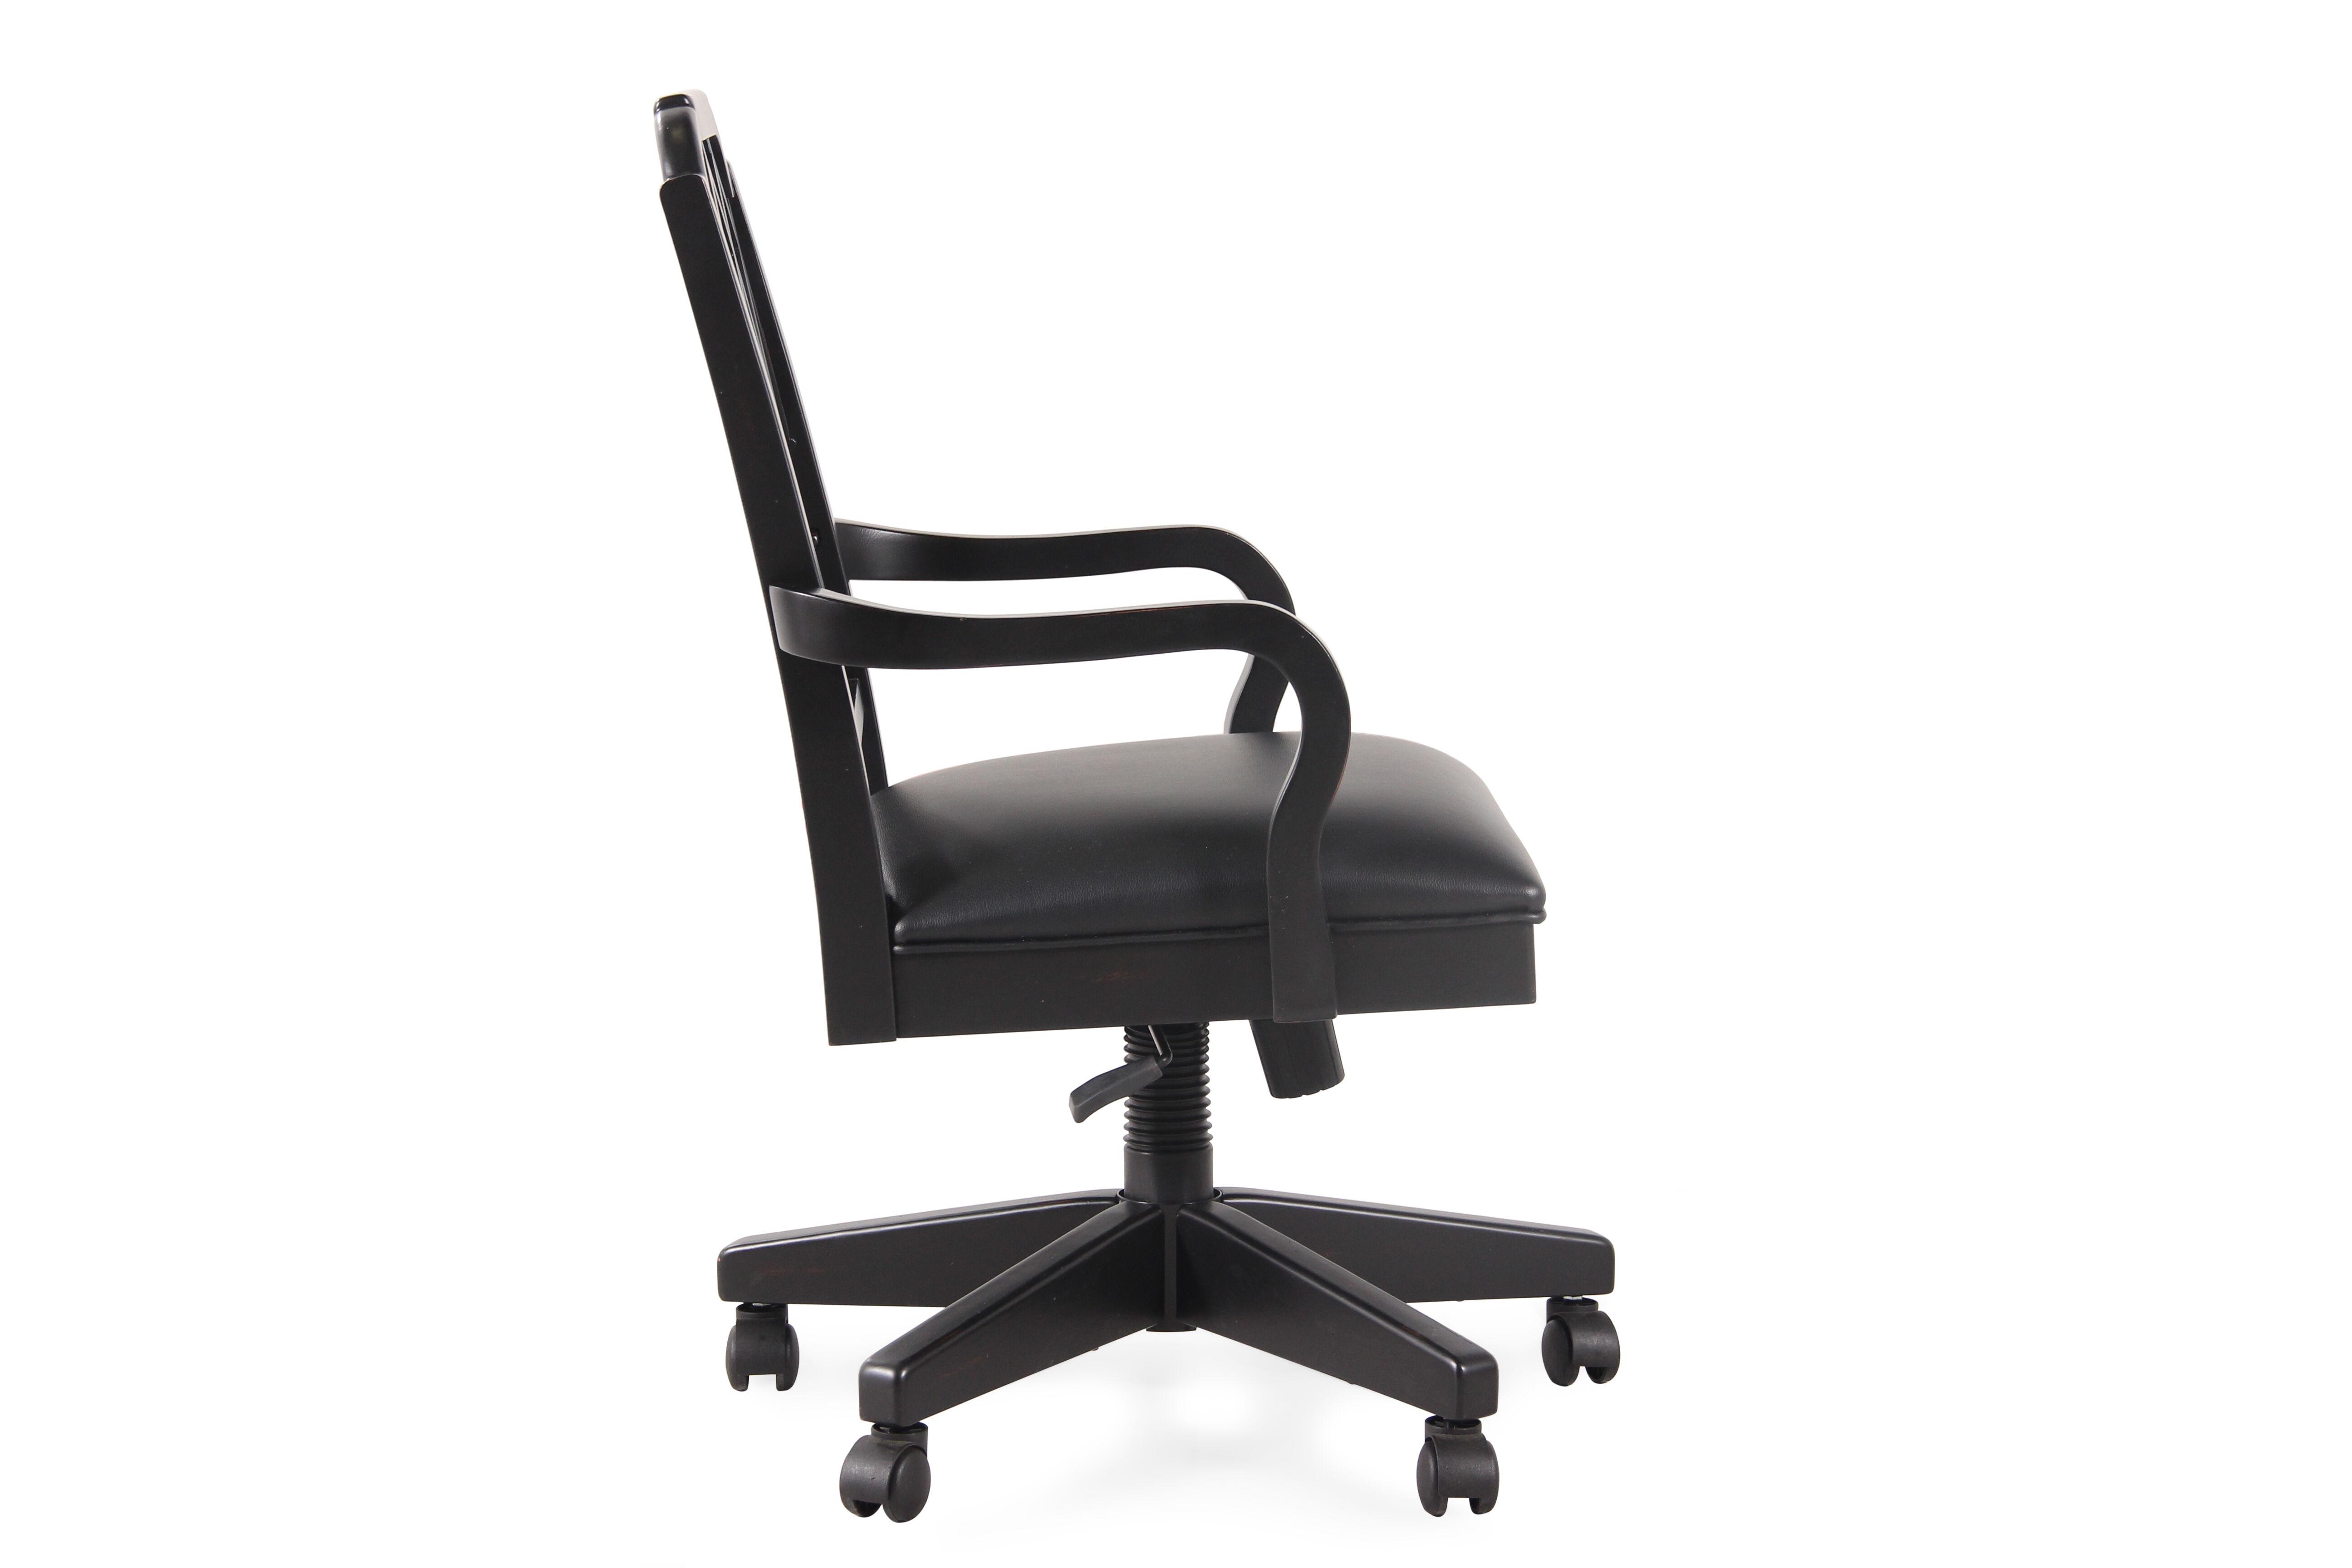 Cathedral Splat Back Swivel Tilt Office Chair In Black